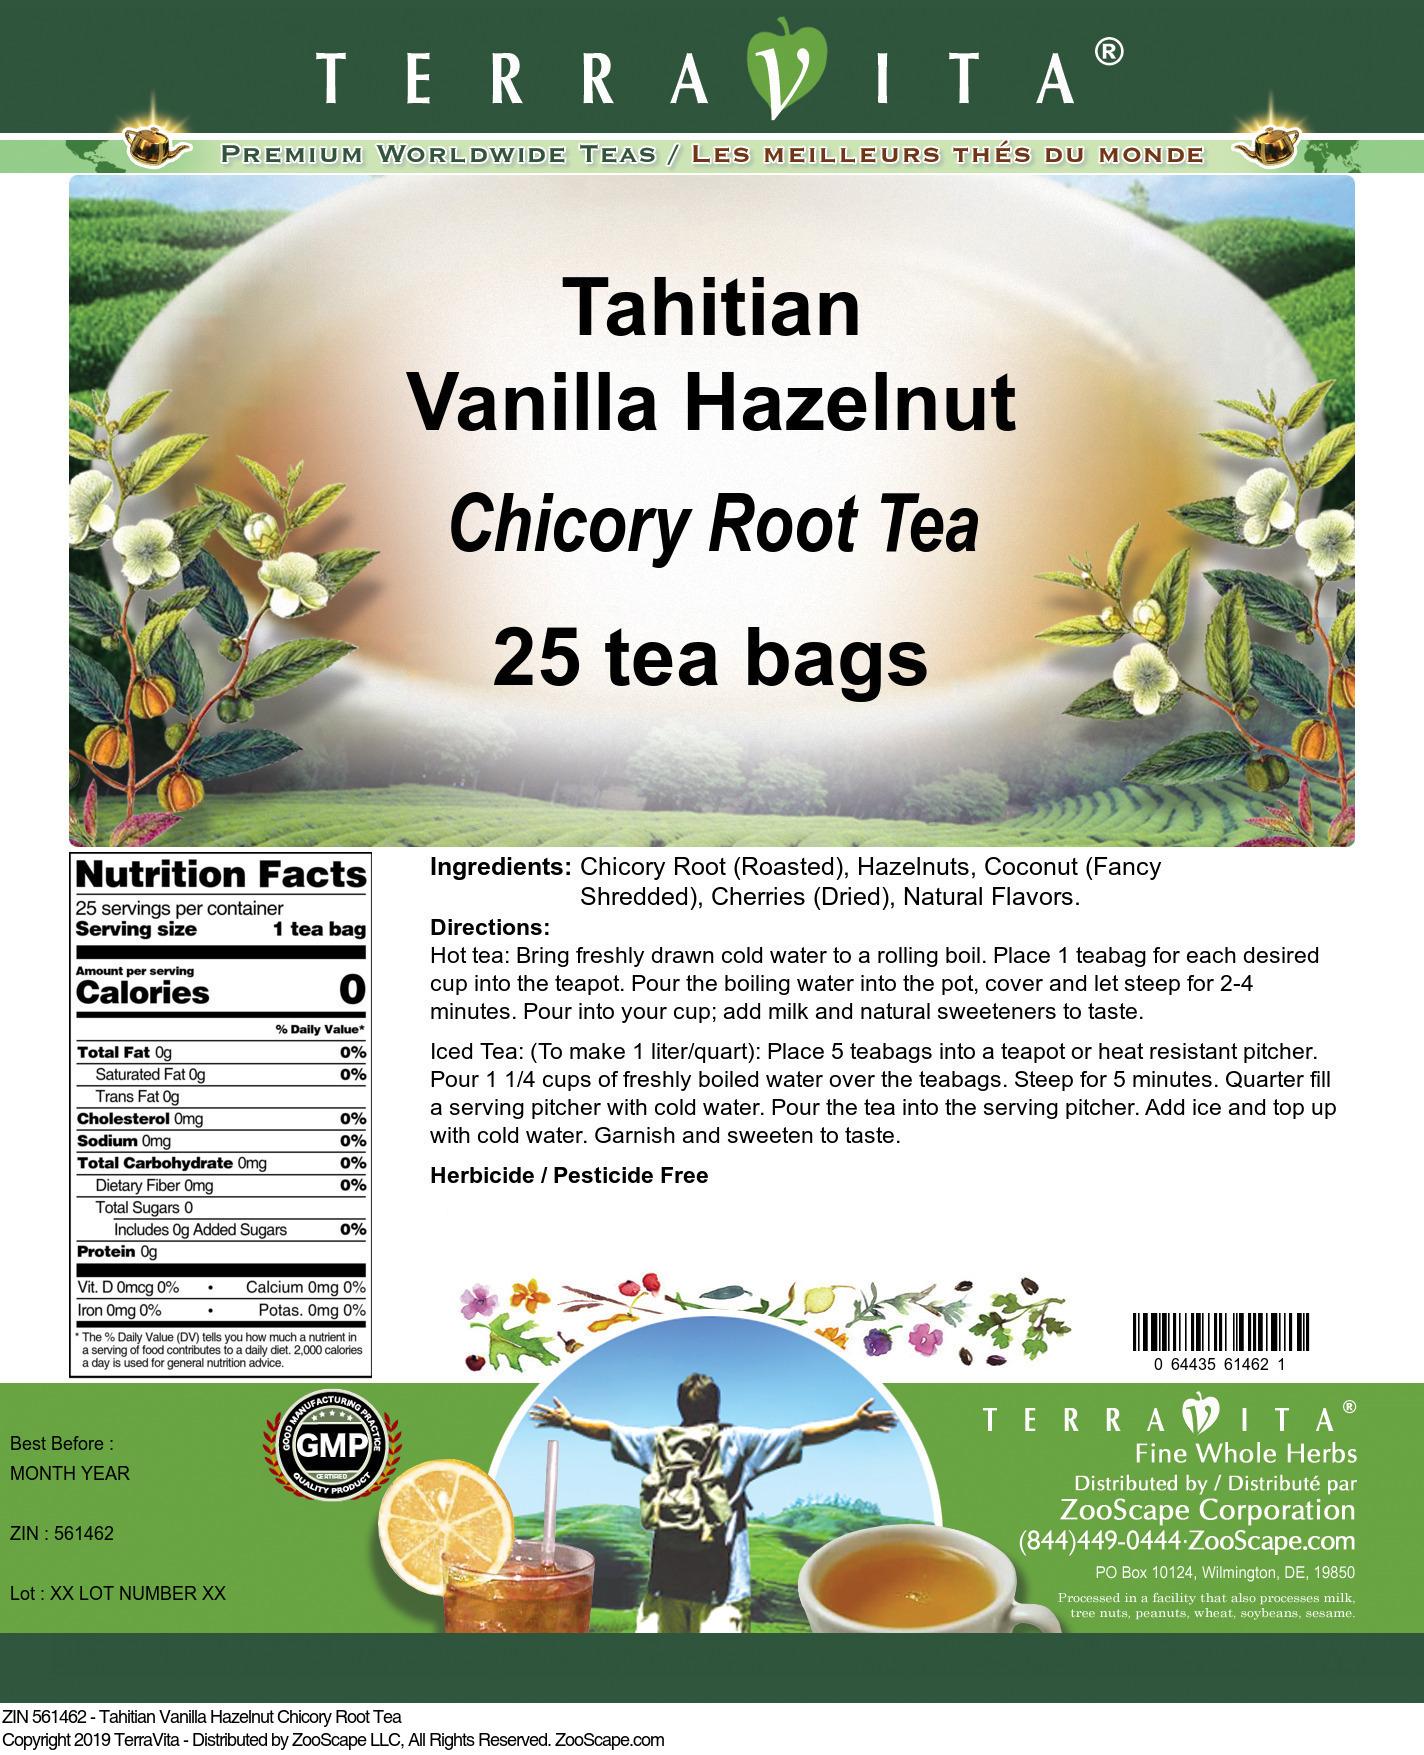 Tahitian Vanilla Hazelnut Chicory Root Tea